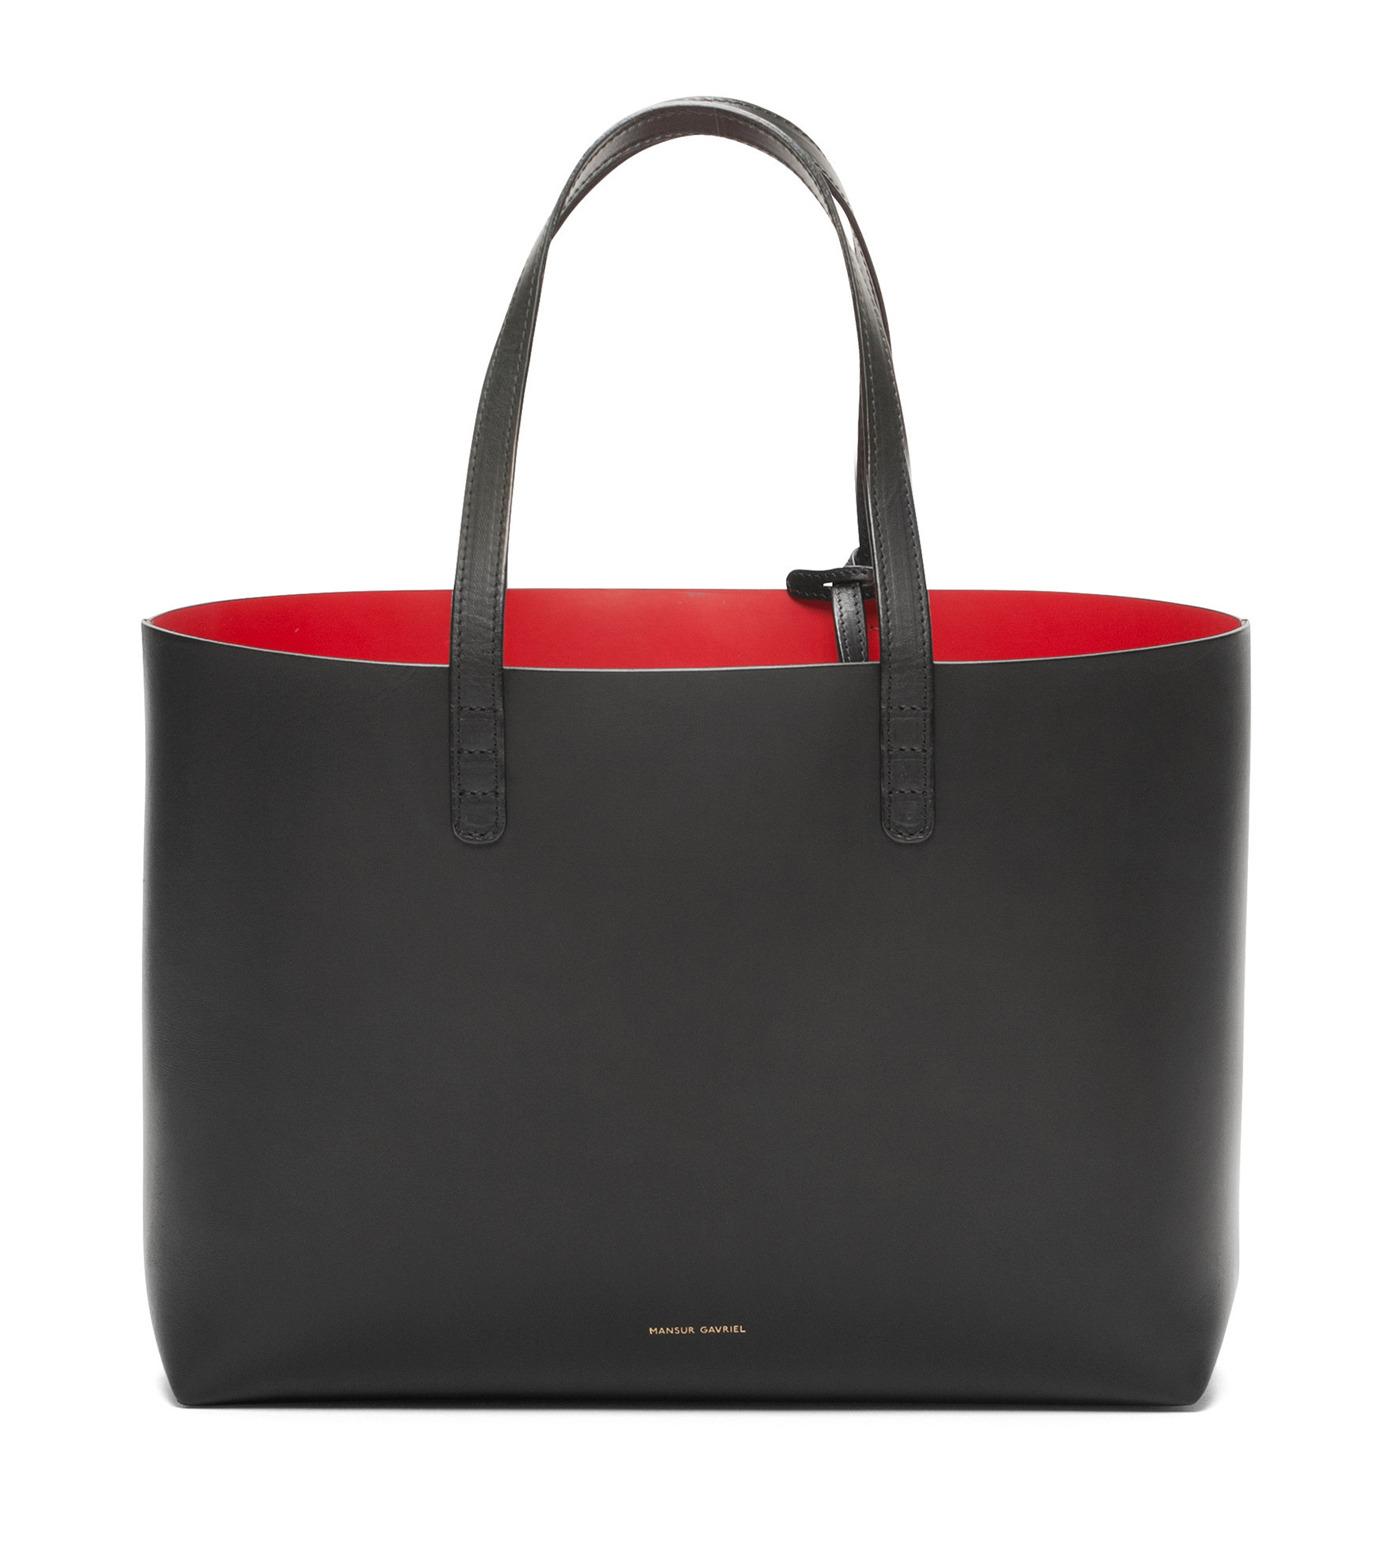 Mansur Gavriel(マンサーガブリエル)のSmall Tote-BLACK(バッグ/bag)-002A-13 拡大詳細画像1